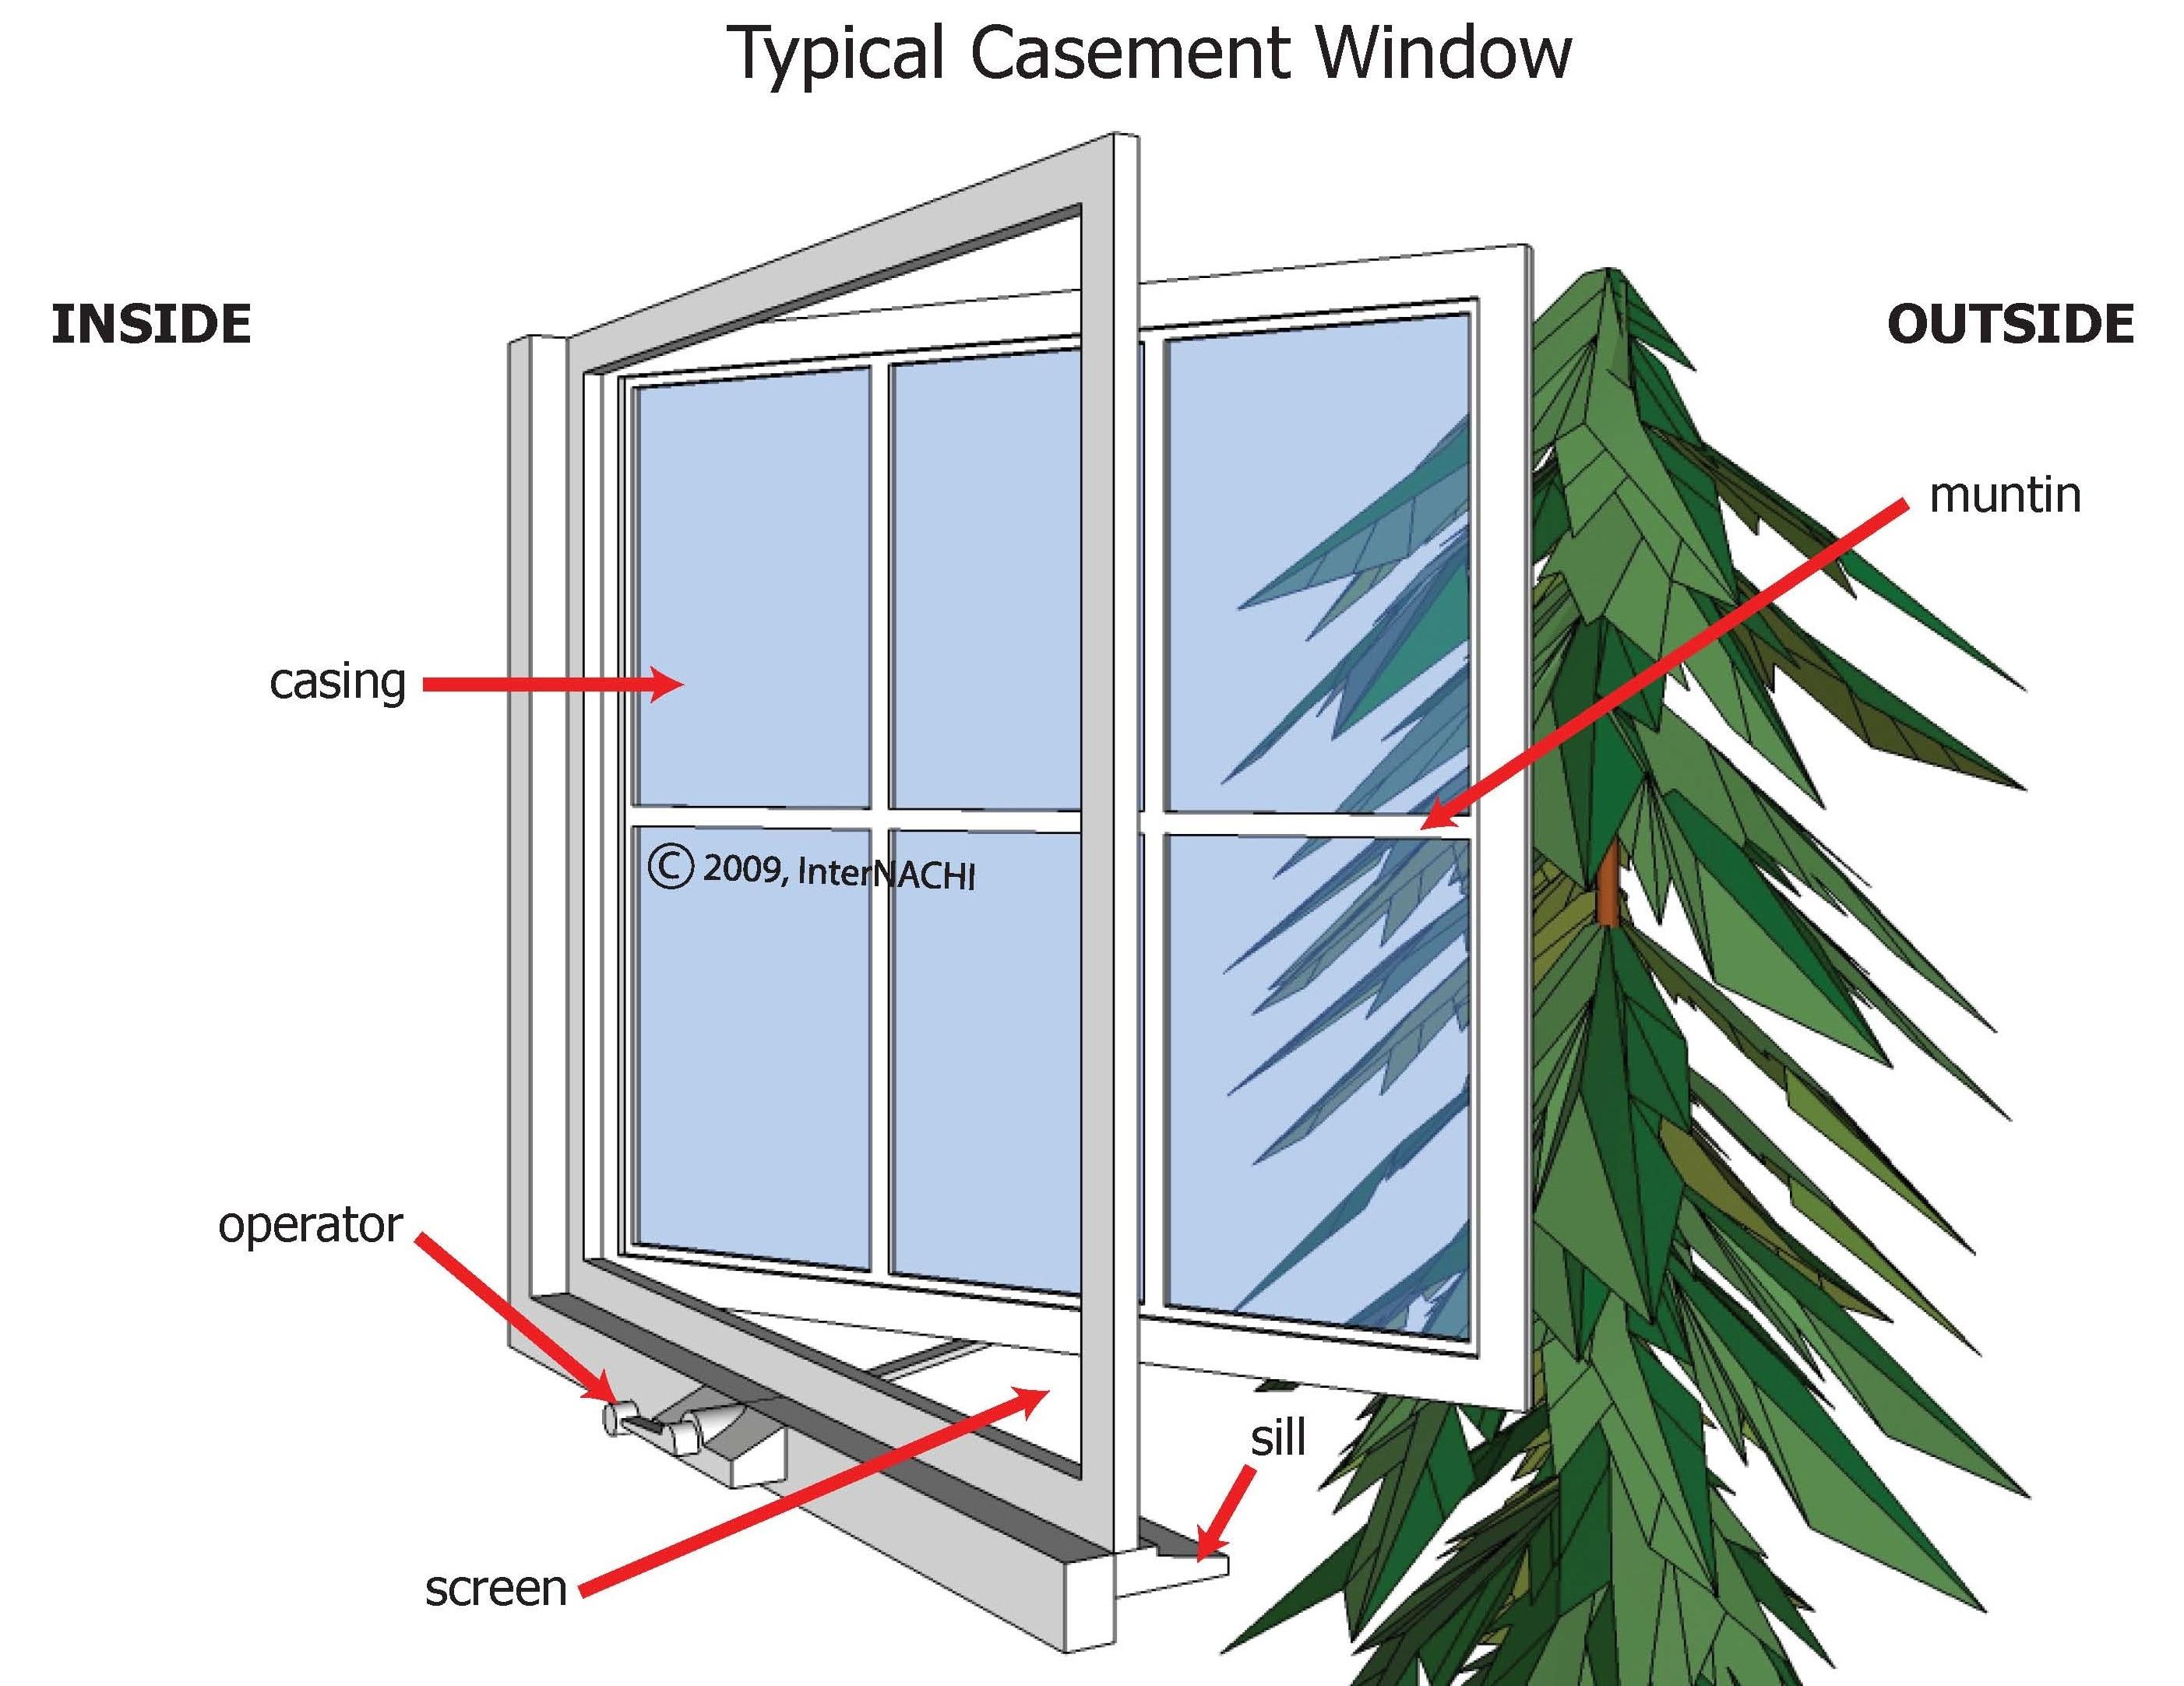 Casement window.